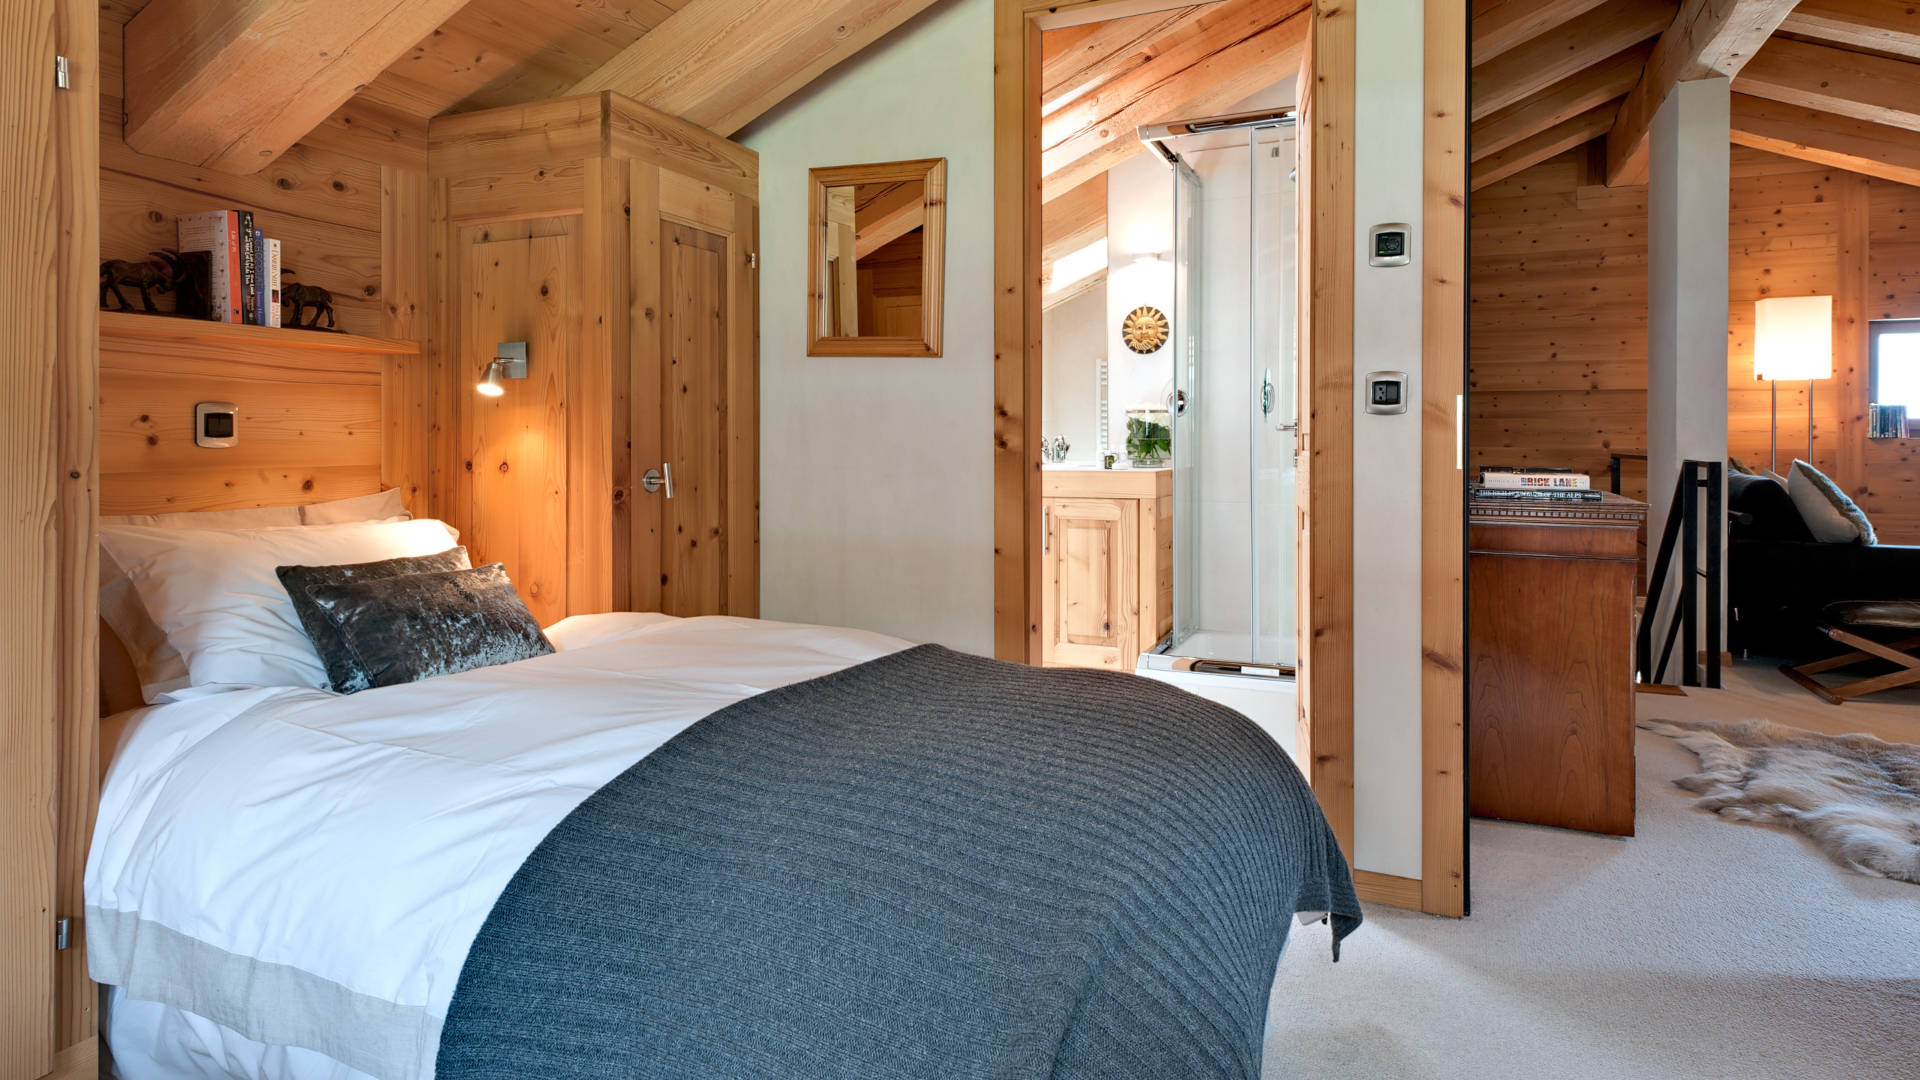 chalet-ect-bedroom3-2